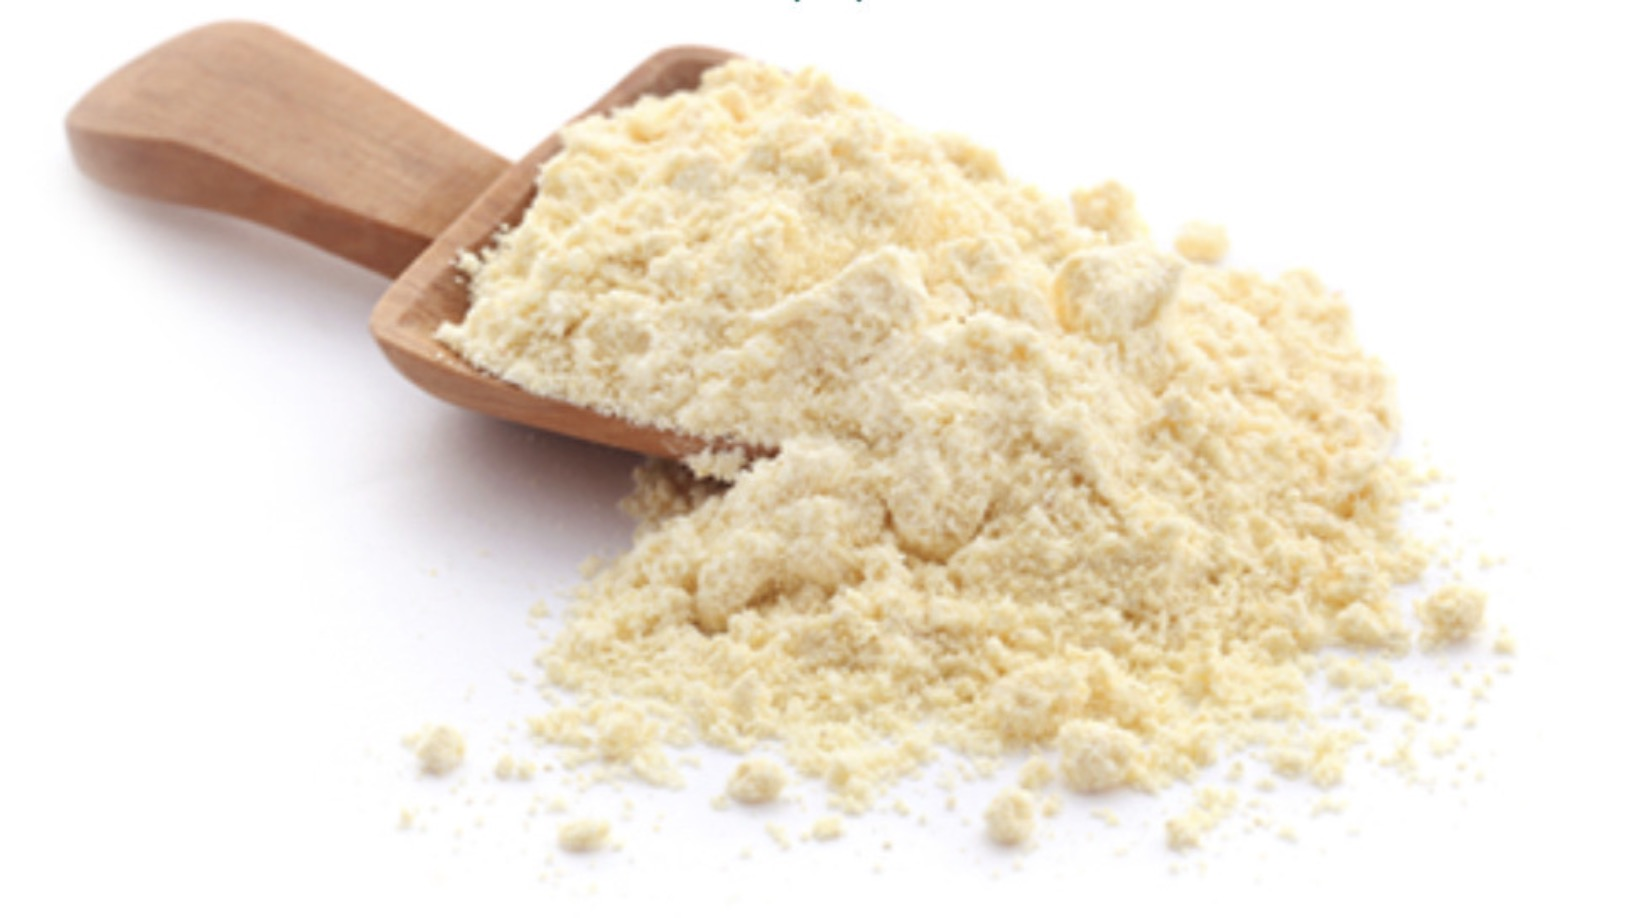 Sophie's Bionutrients: Alternative protein from microalgae